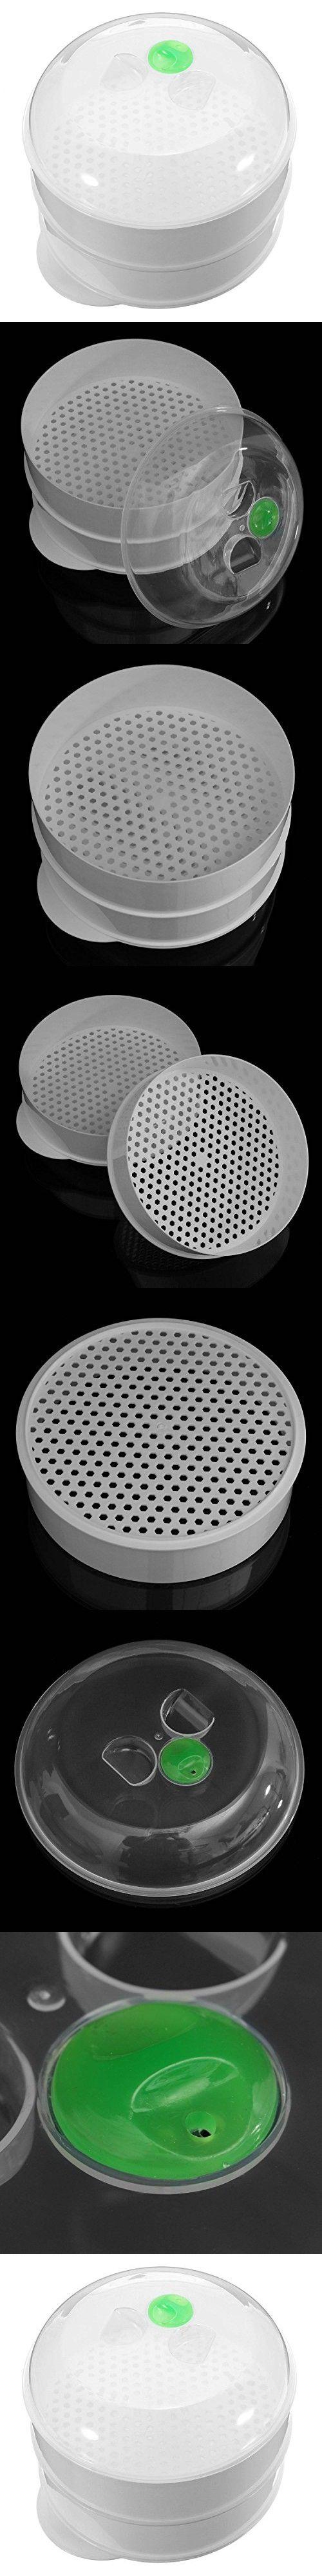 Kingso 2 Tier Plastic Vegetable Microwave Steamer 709*591 Inch